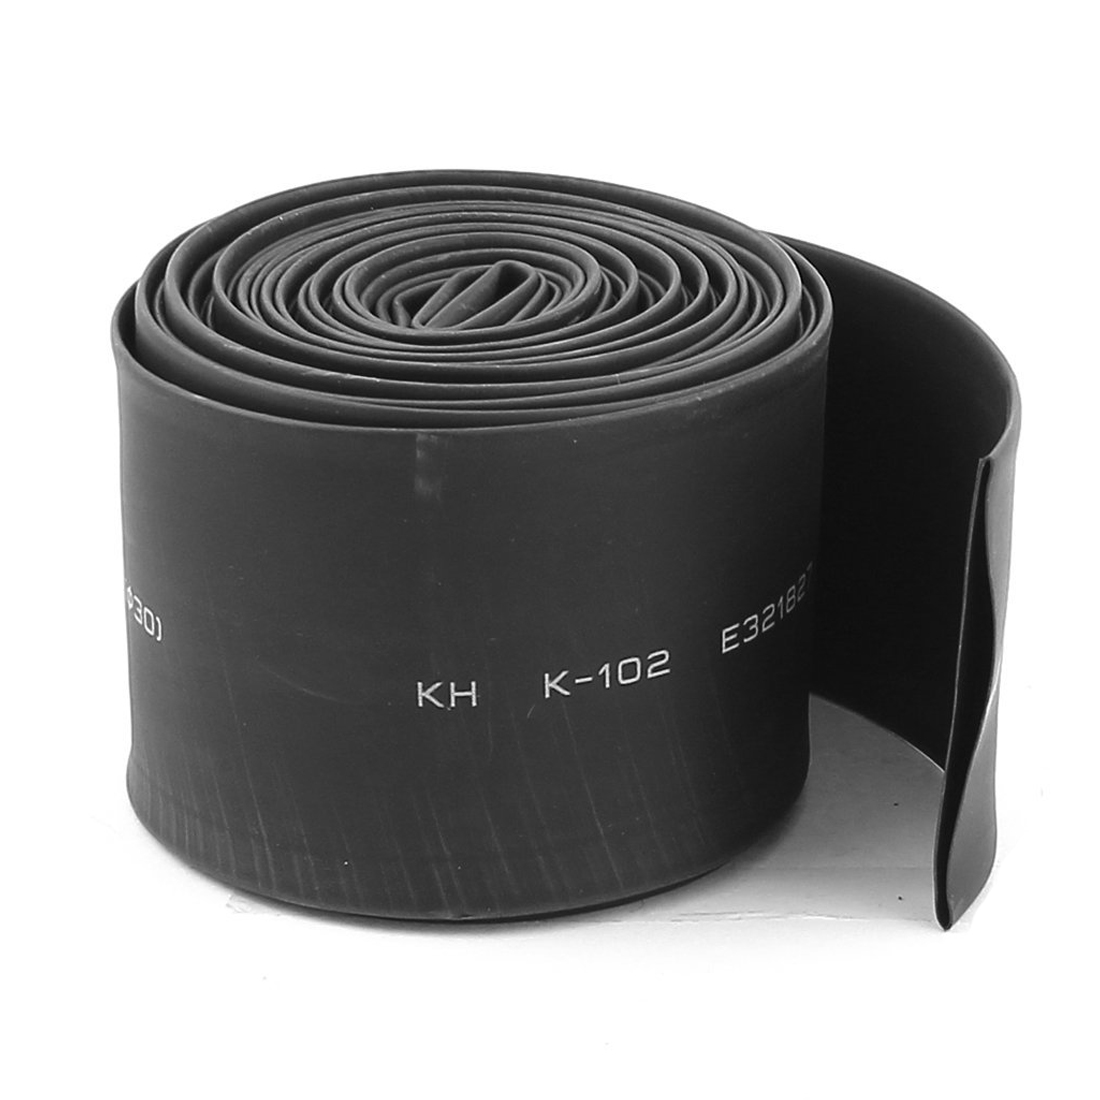 High Quality 4 m Polyolefin Heat Shrinkable Tube Sleeve 2:1 Shrink Ratio diameter 30 mm